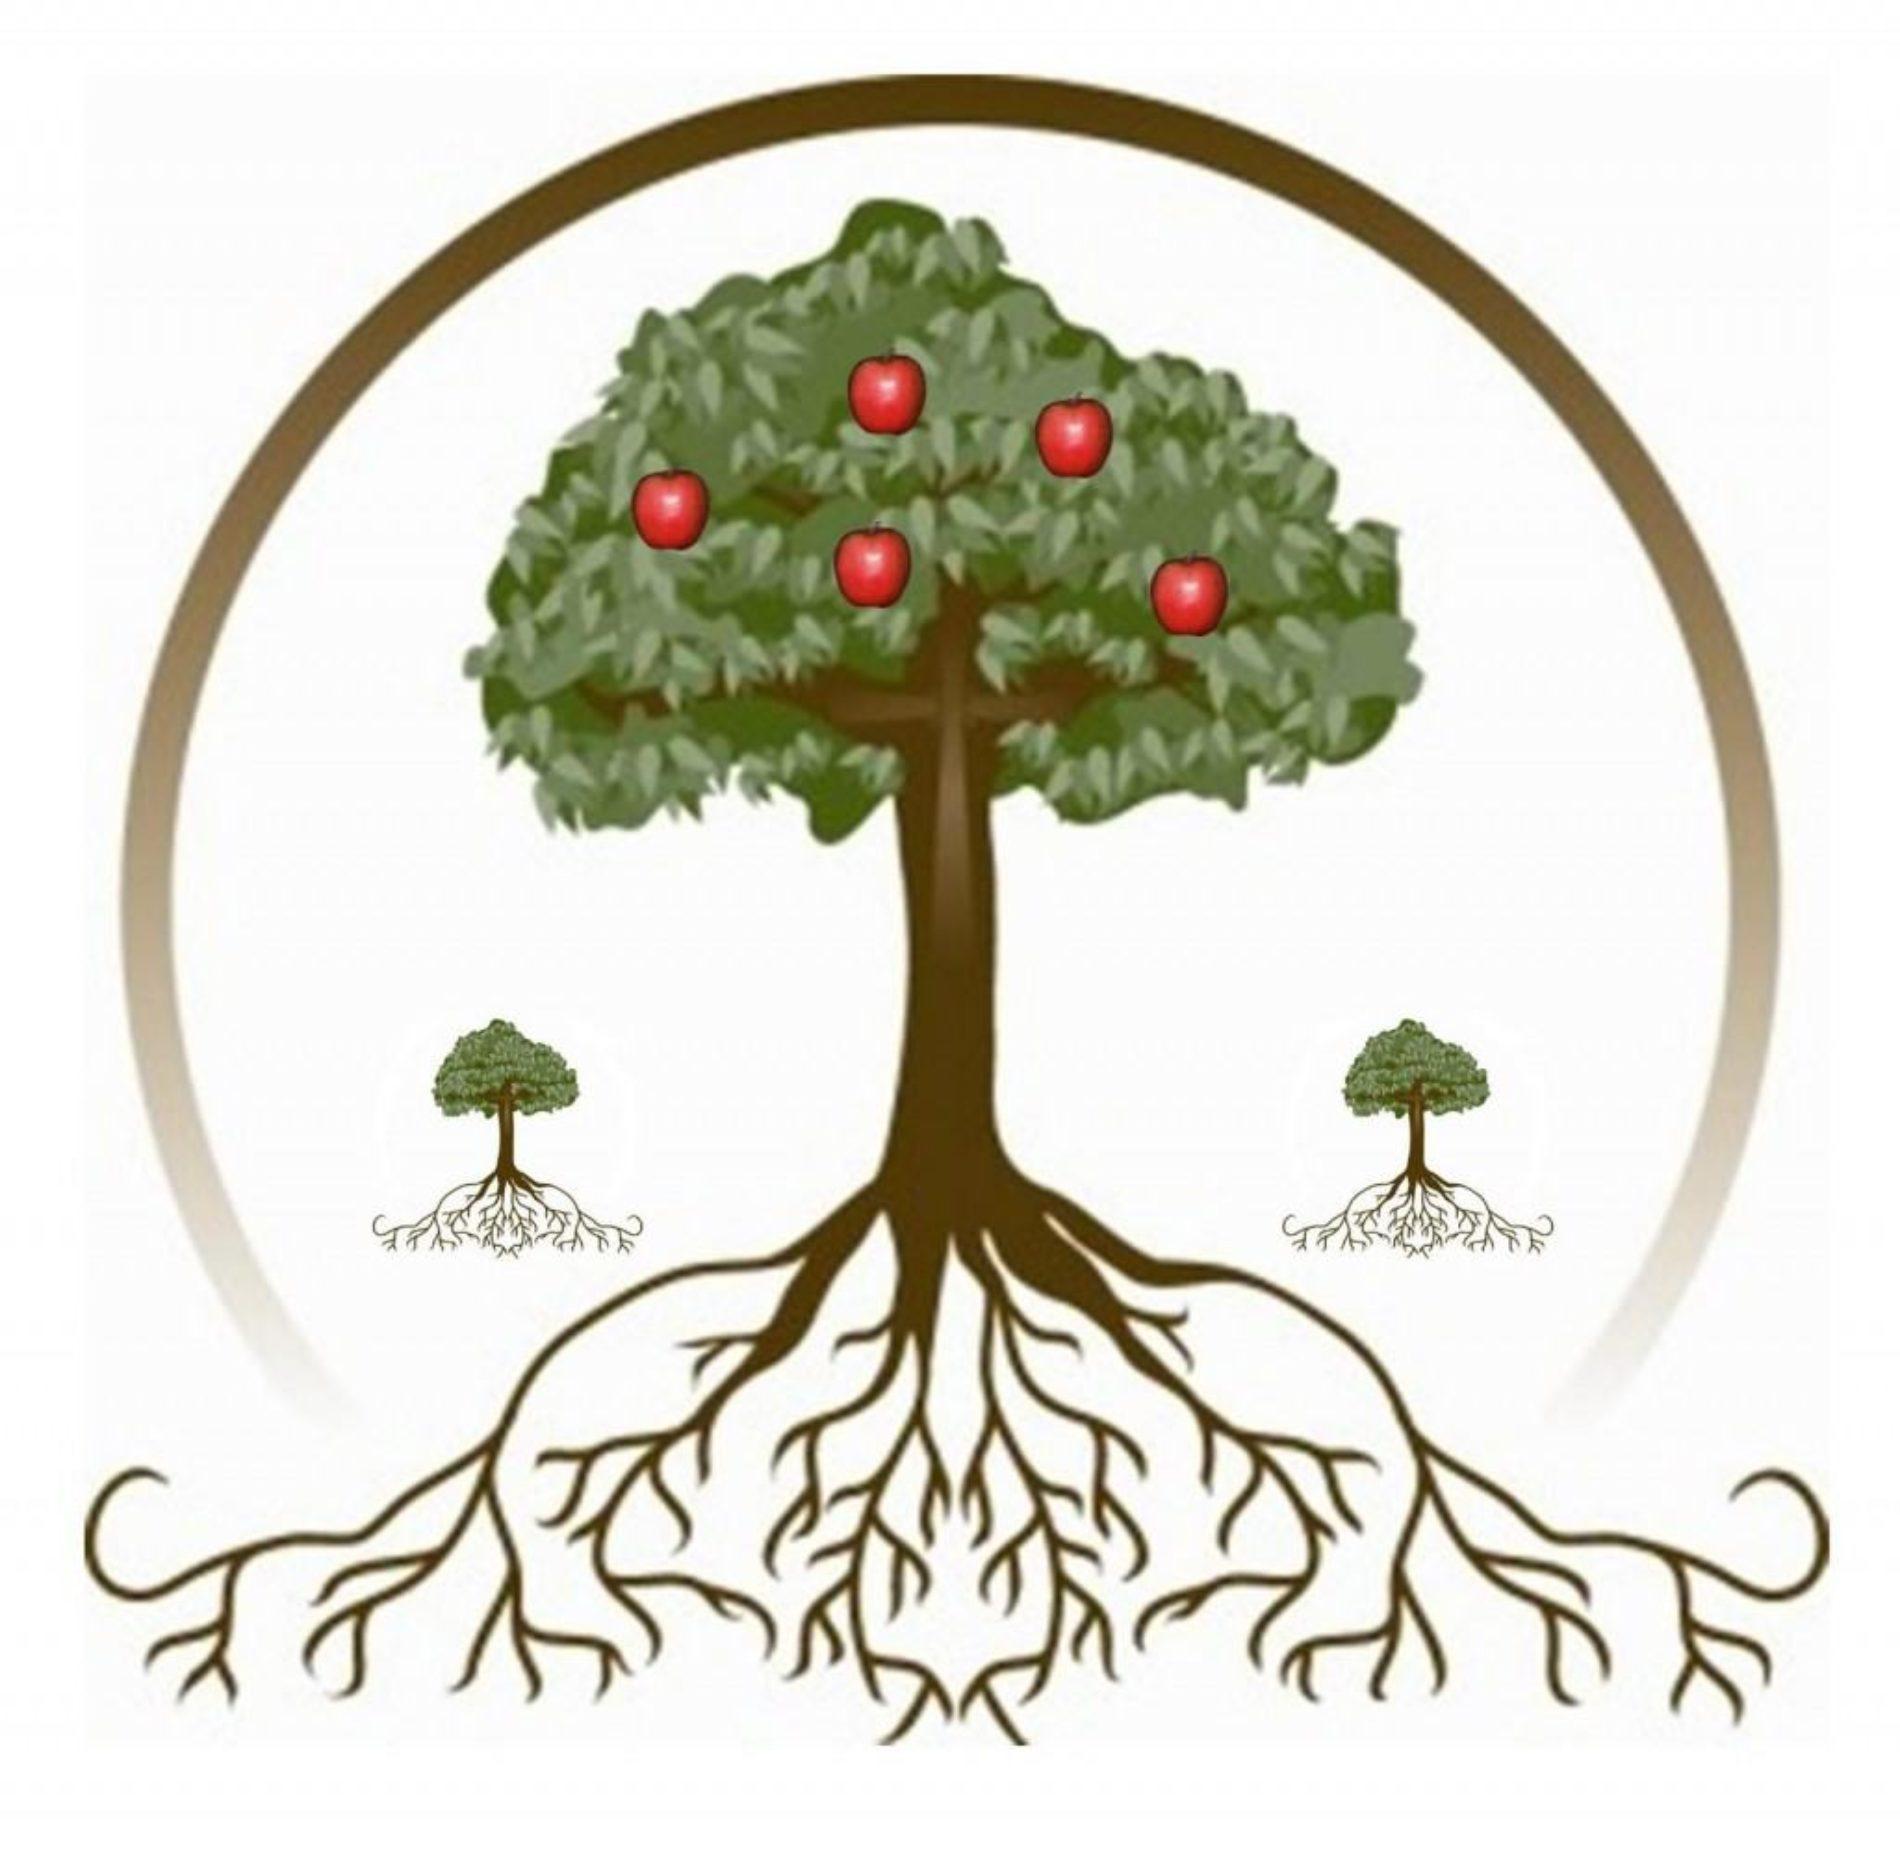 Каждому переговорщику — дерево в подарок!